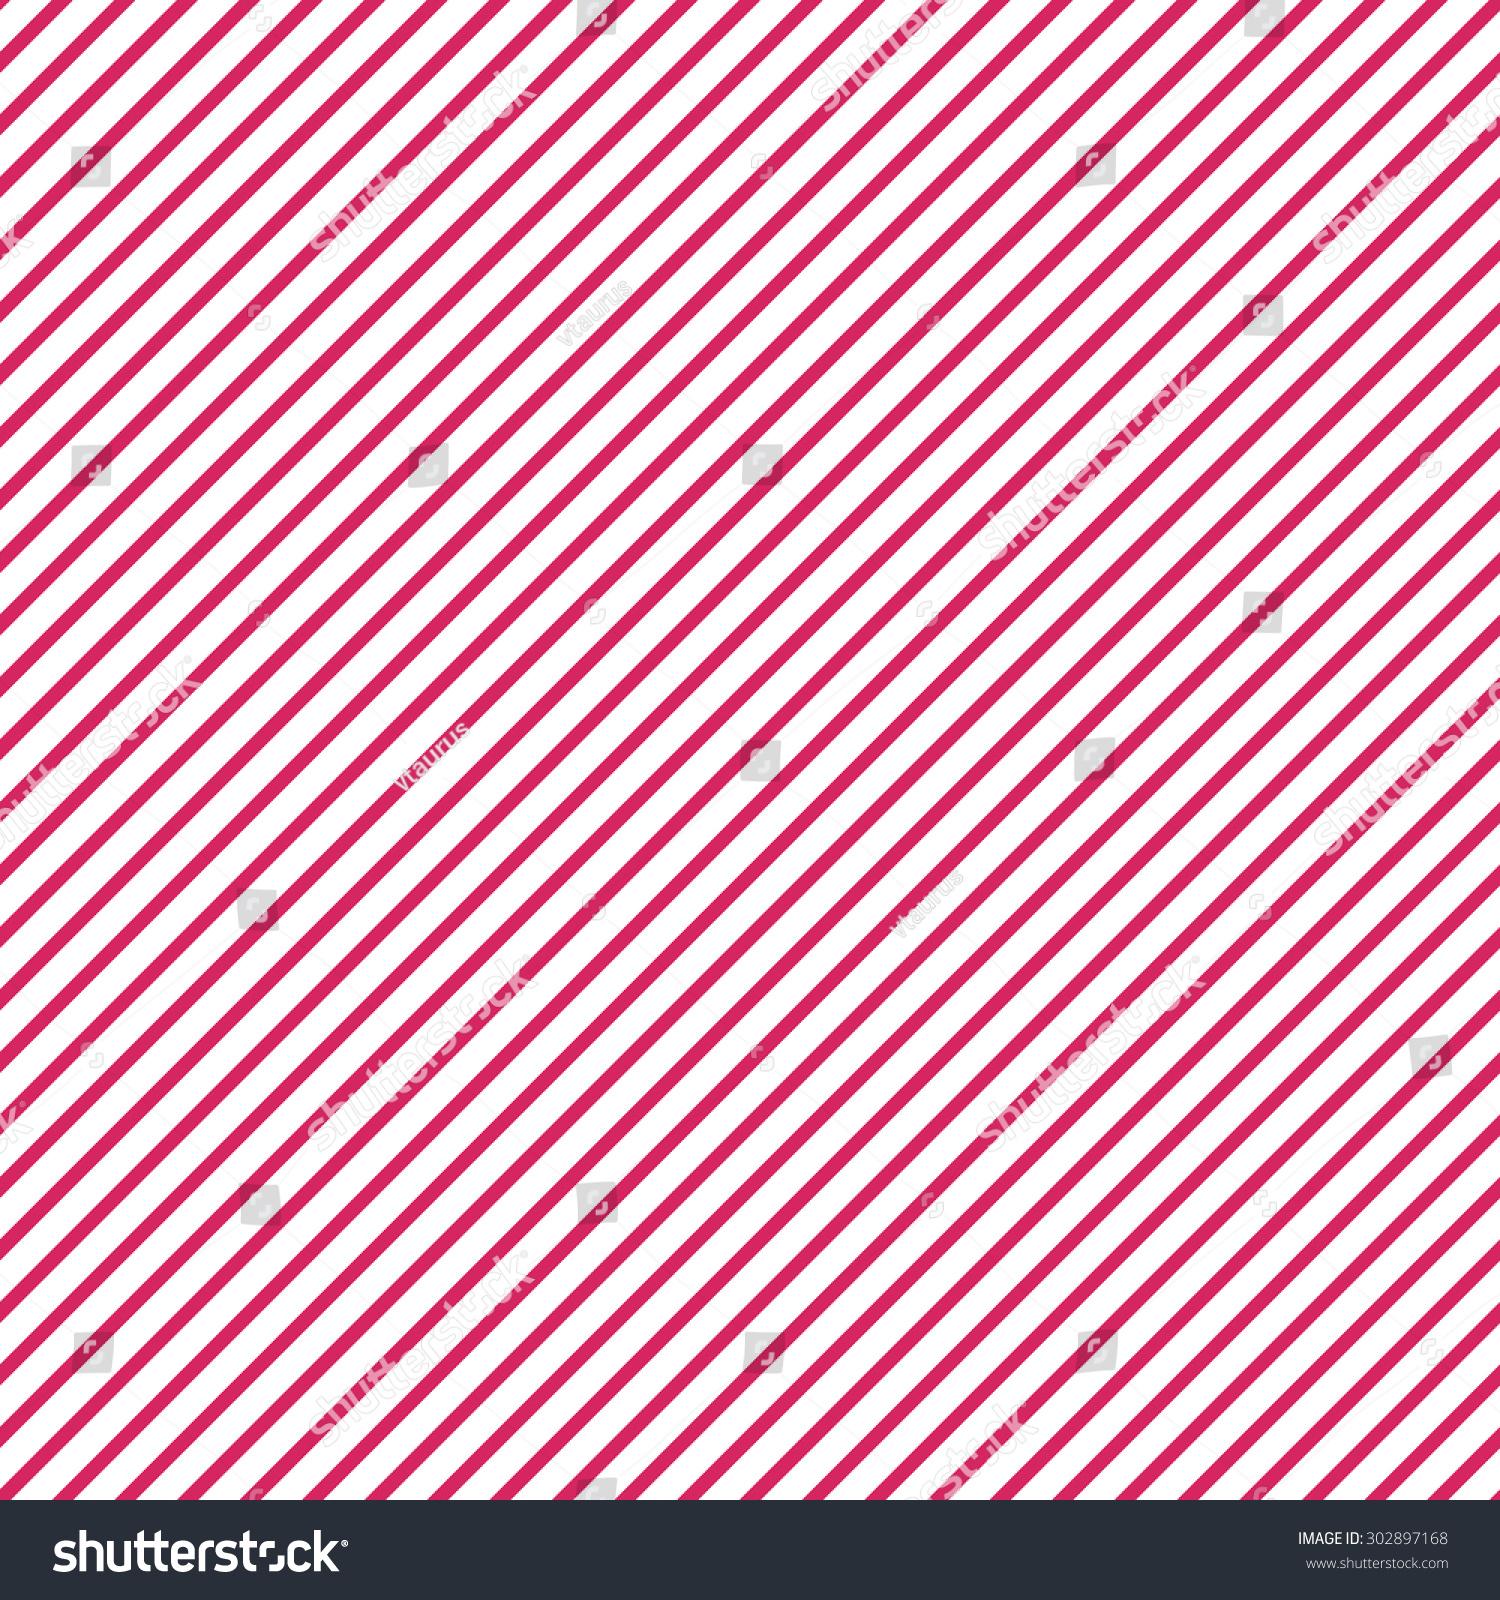 Seamless Striped Pattern Background 302897168